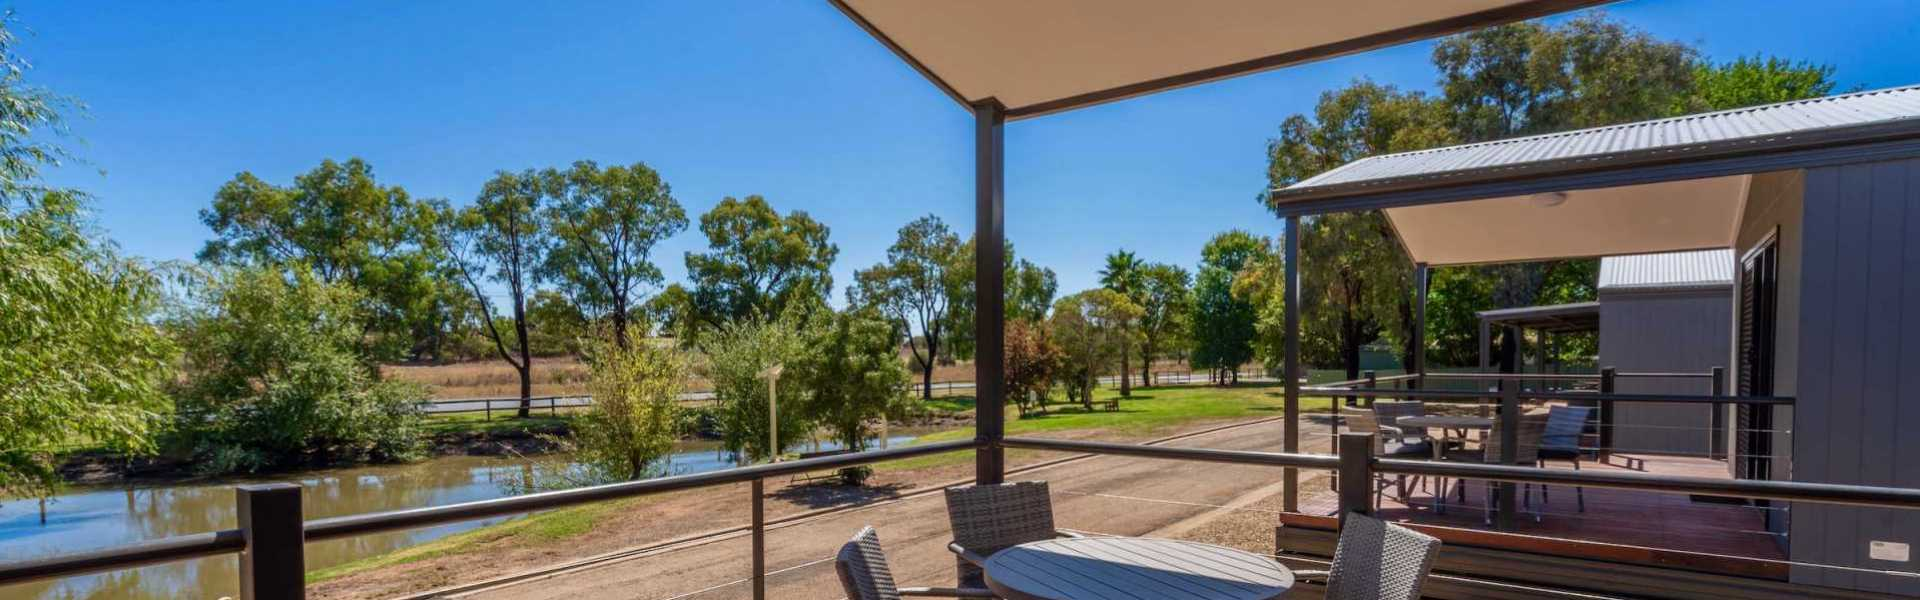 Kui Parks, Horseshoe Tourist Park, Wagga Wagga, Dam